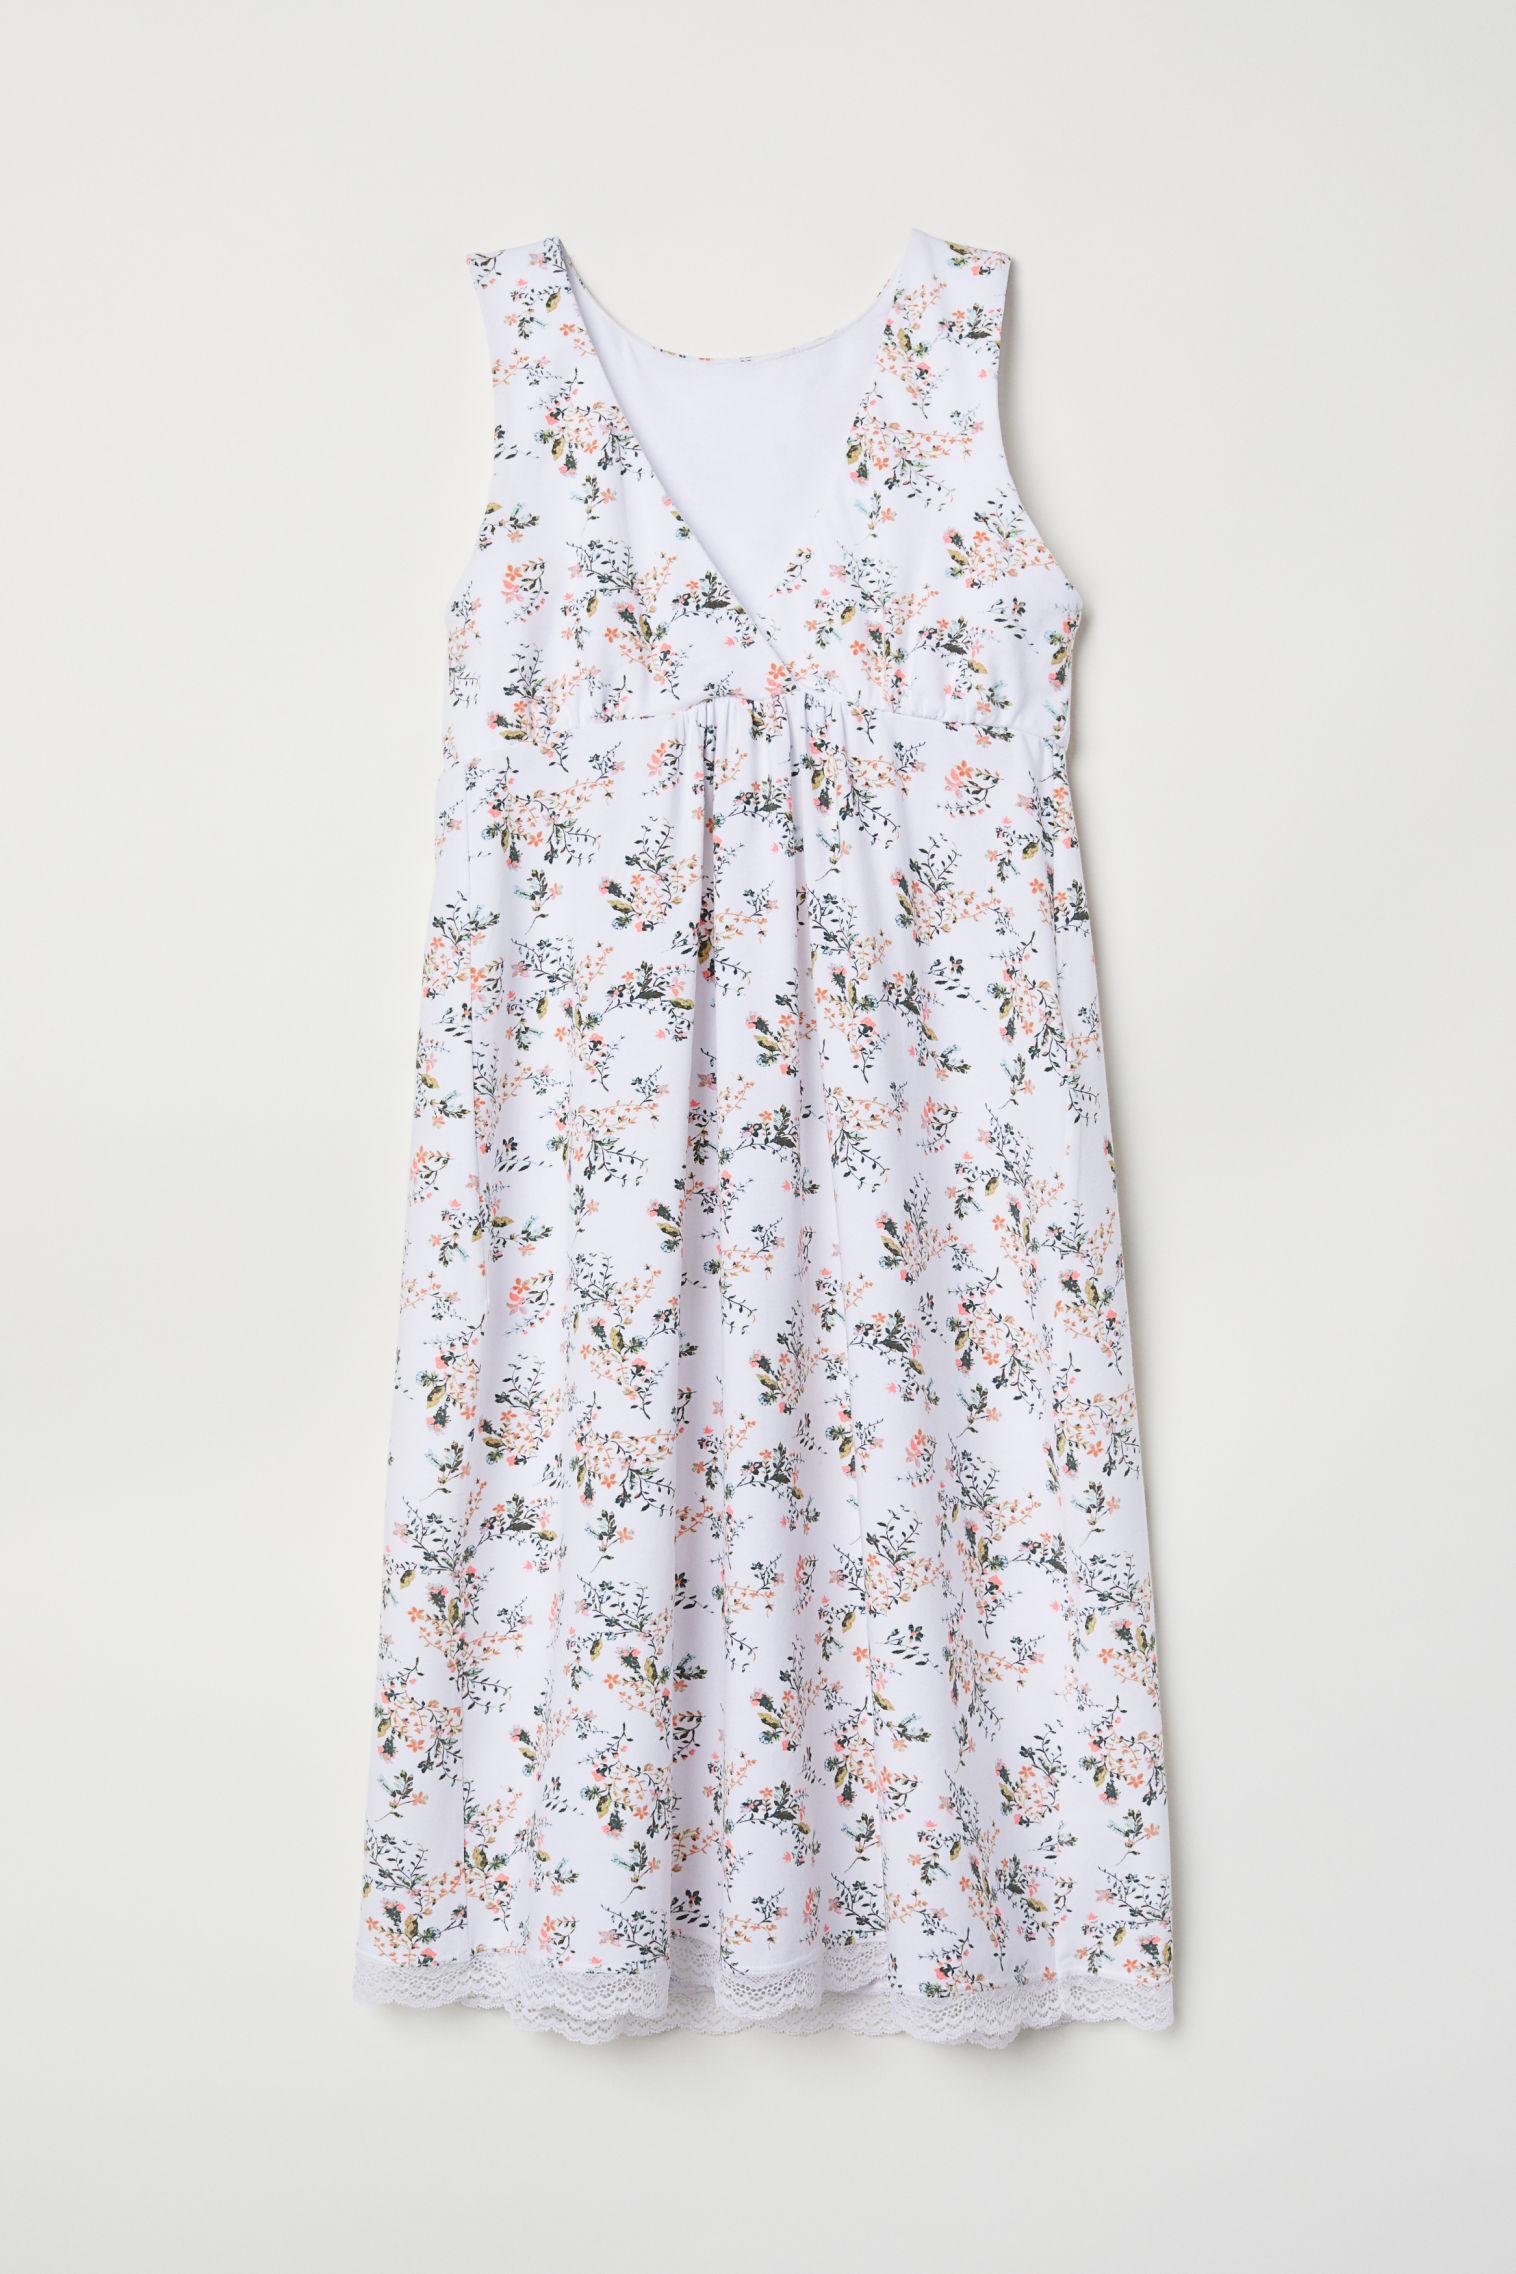 74299a92a7c2b MAMA Nursing Nightgown - White/floral - Ladies | H&M US